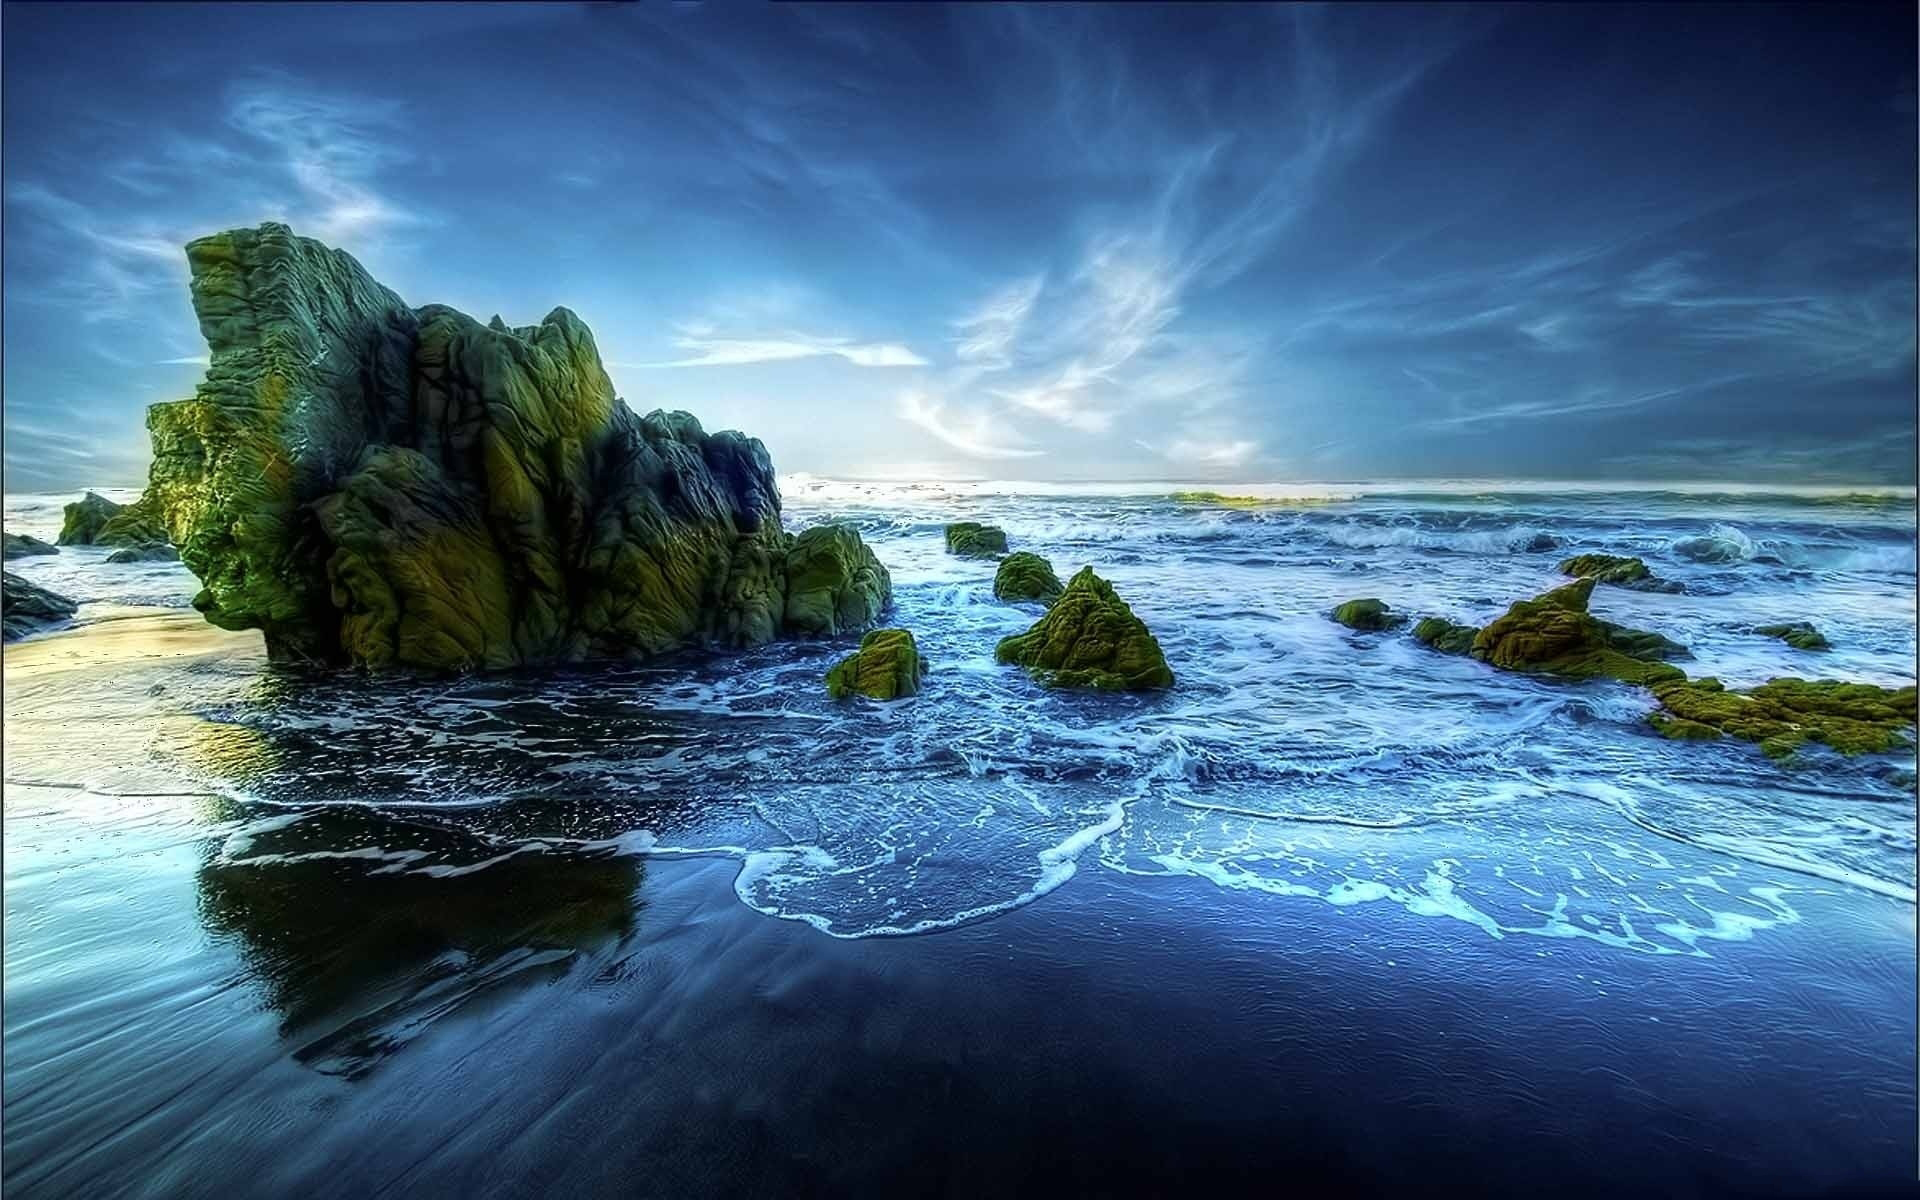 Ocean Hd Wallpaper Background Image 1920x1200 Id 369866